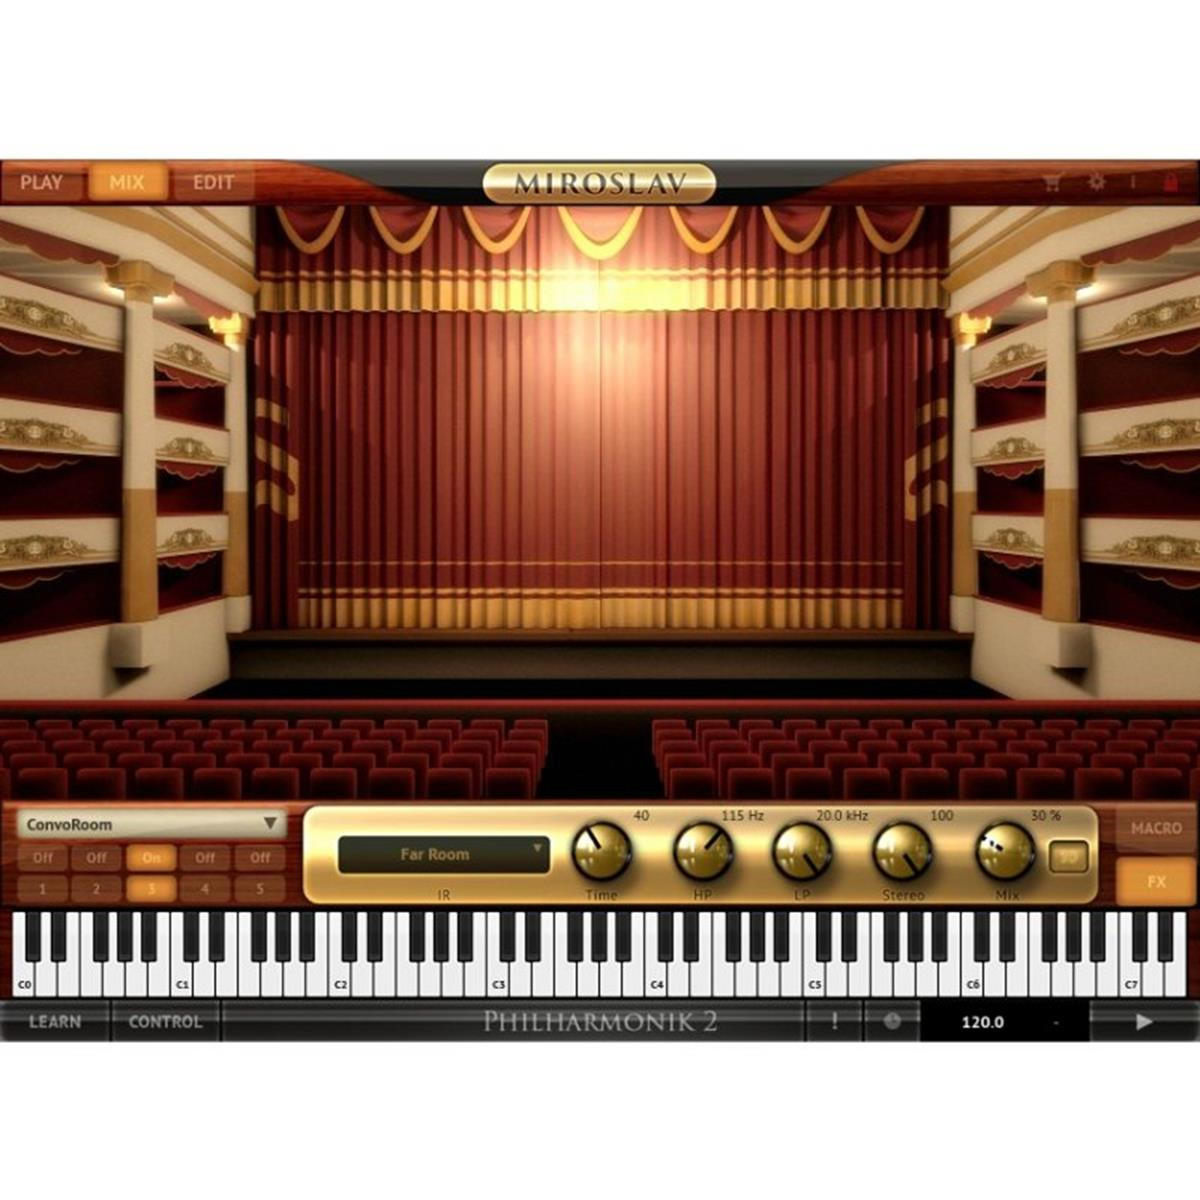 IK Multimedia Miroslav Philharmonik 2 - orchestra virtuale per MAC e PC (64 bit) - Crossgrade